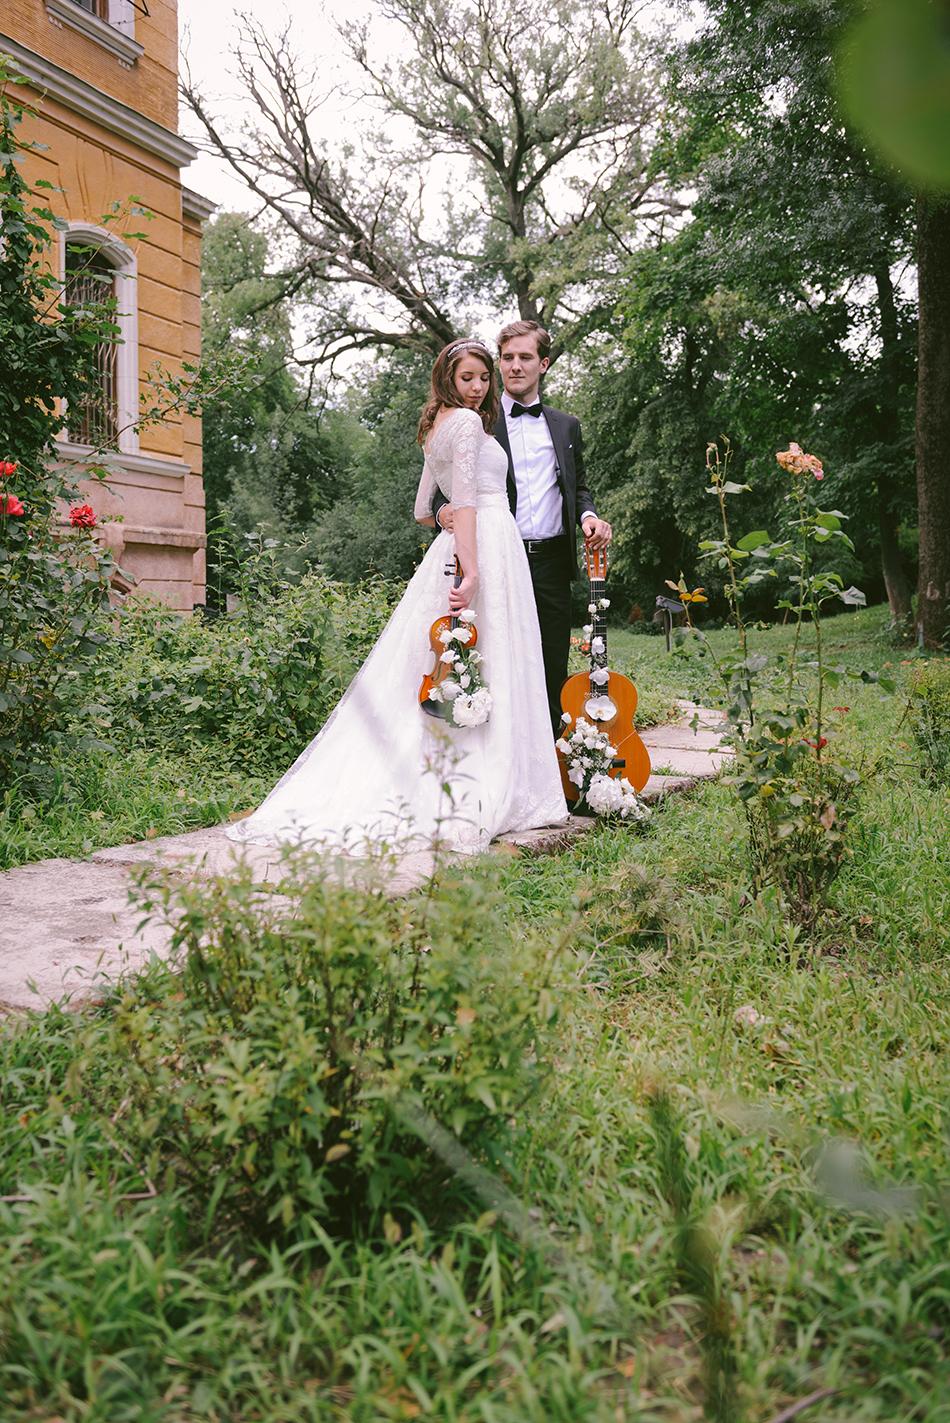 AD Passion Photography | sami-ela-lela-nunta-domeniu-lupas-arad_0042 | Adelin, Dida, fotograf profesionist, fotograf de nunta, fotografie de nunta, fotograf Timisoara, fotograf Craiova, fotograf Bucuresti, fotograf Arad, nunta Timisoara, nunta Arad, nunta Bucuresti, nunta Craiova